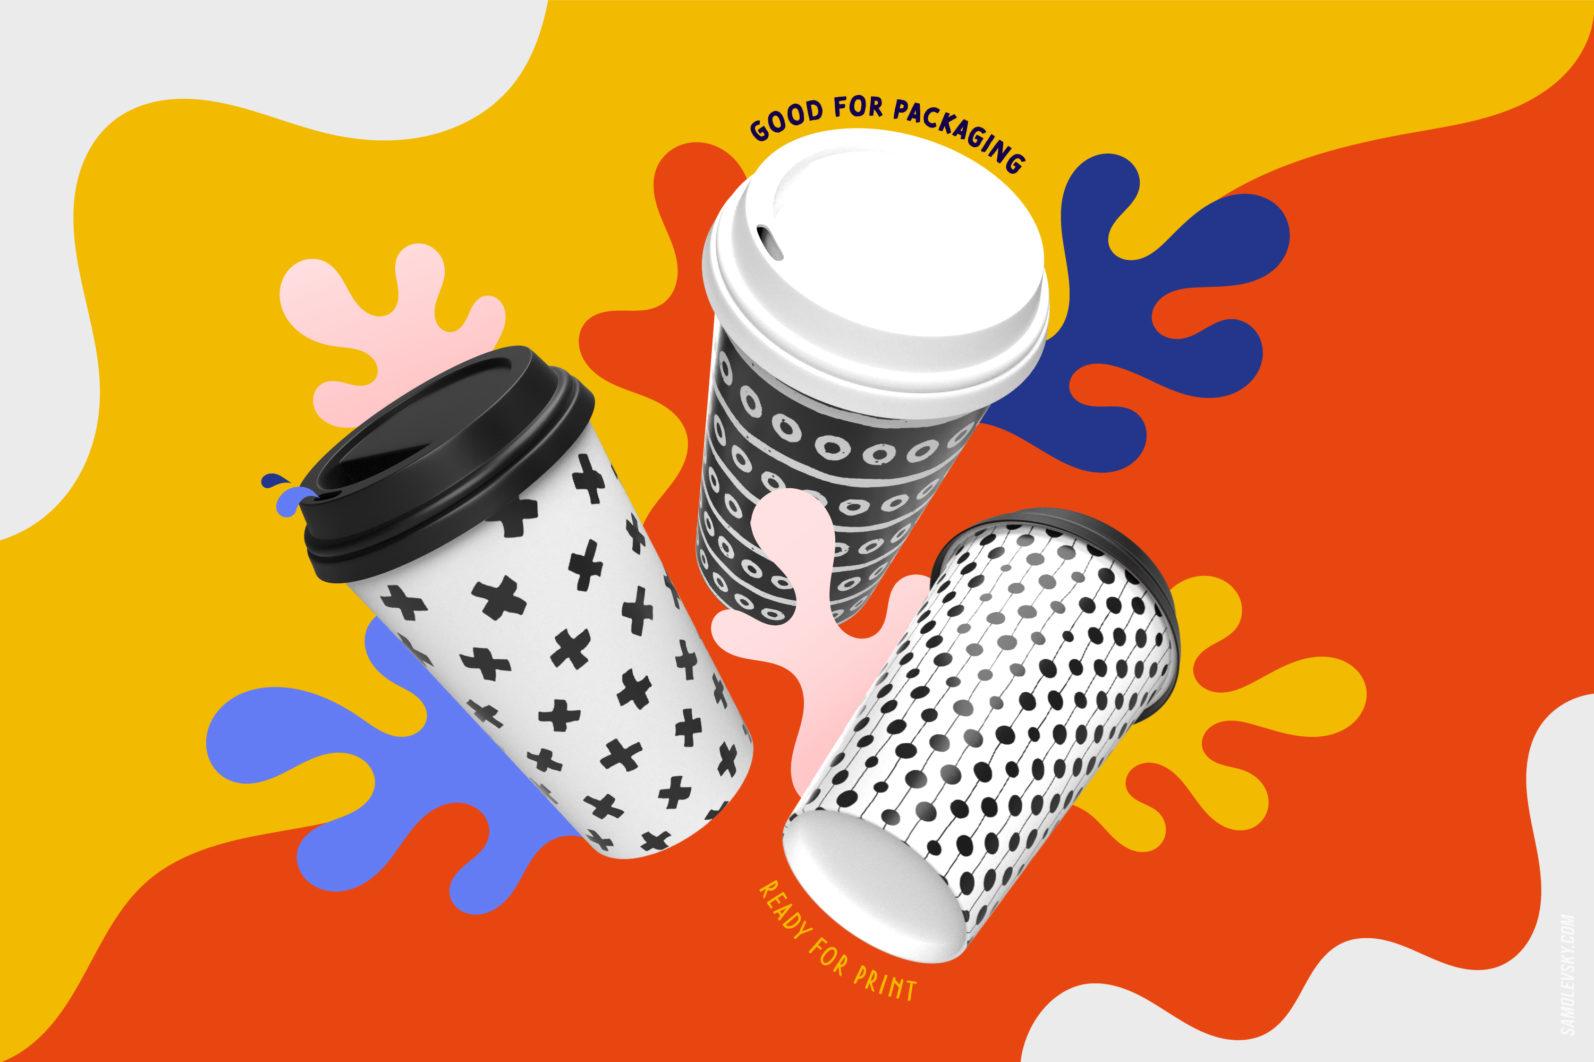 Handmade patterns bundle - 300 seamless patterns, brushes, and shapes - Samolevsky.com Handmade patterns bundle 07 scaled -